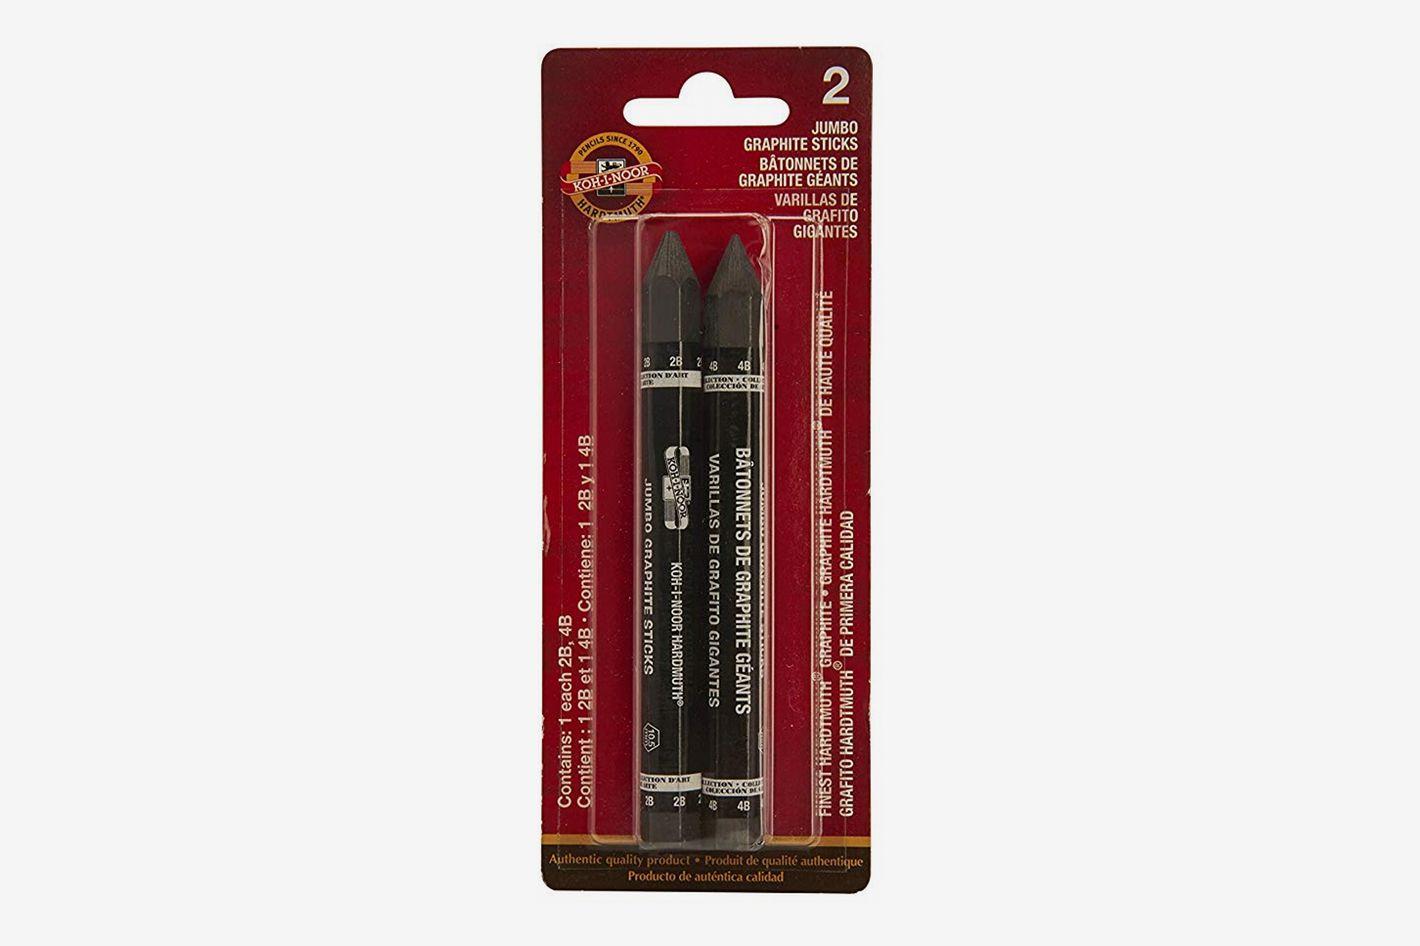 Koh-I-Noor Jumbo Graphite Stick Set, 2B and 4B Degrees